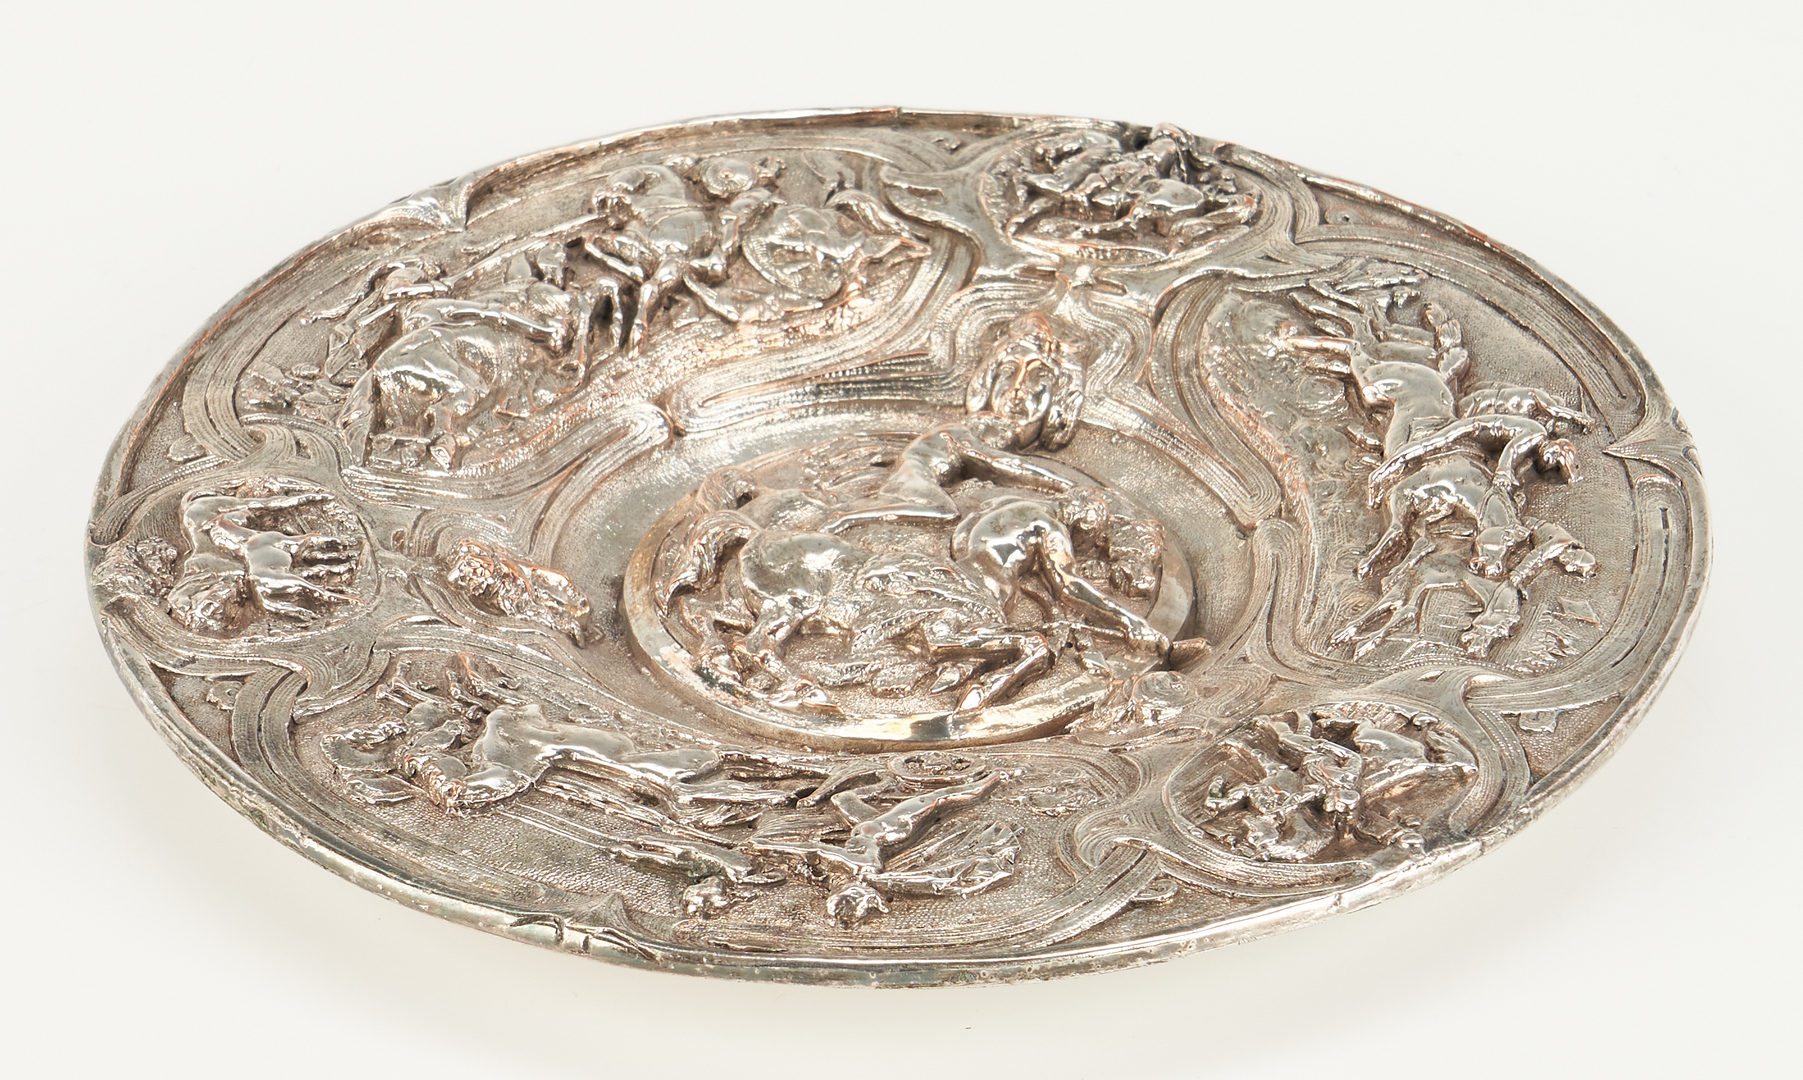 Lot 276: Continental Silver Salt Neff and Horse Motif plate